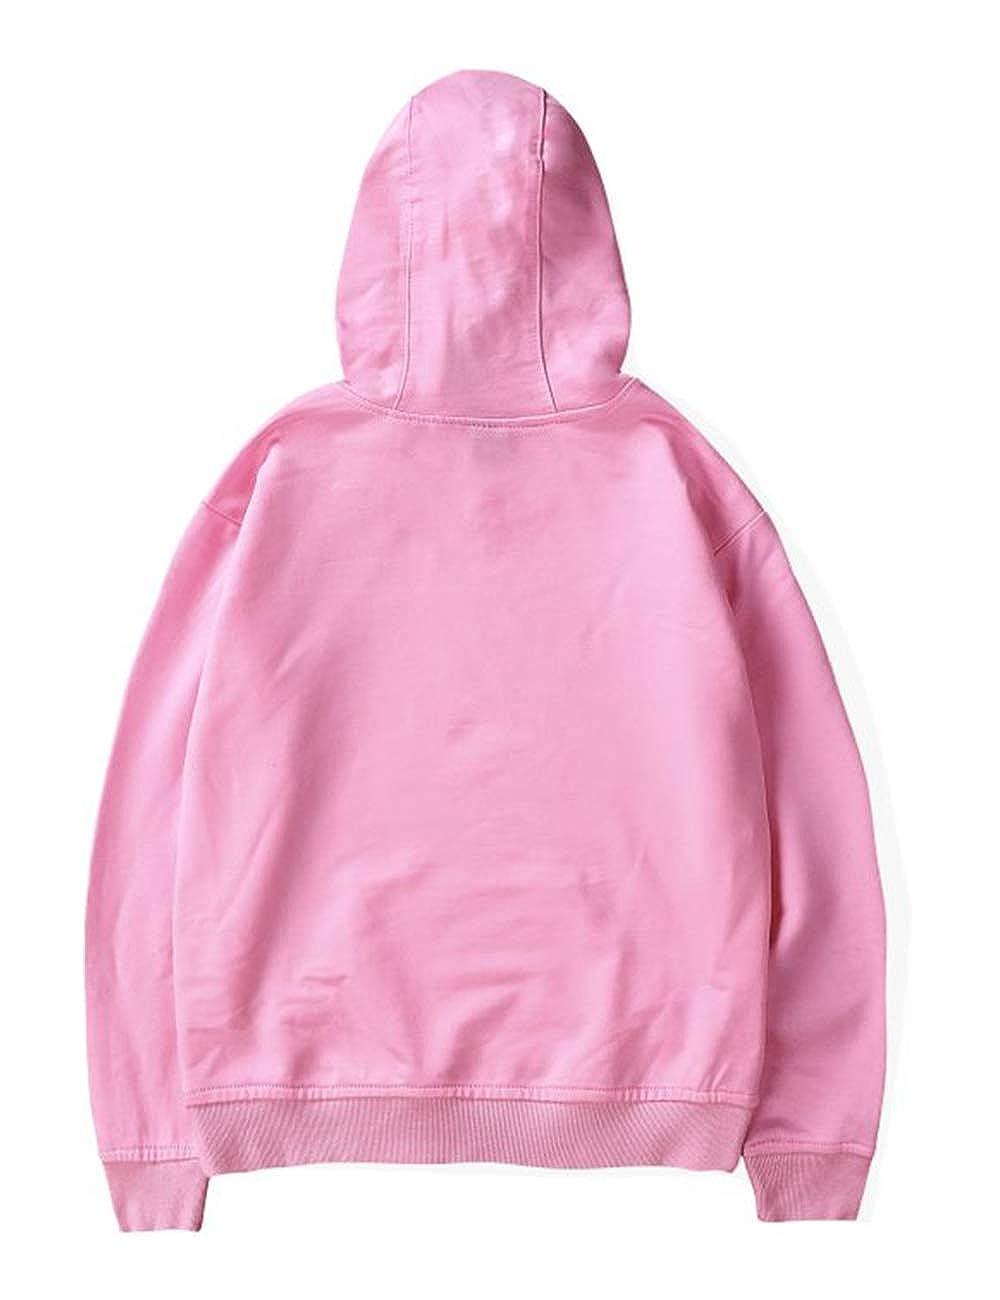 Women Friends Dont Lie 3D Printed Sweatshirt Unisex Men Ladies Eleven Dustin Robin Jumper Teen Boys Kids Fashion Pullover Sweater Clothes Merchandise Stranger Things Hoodie Girls